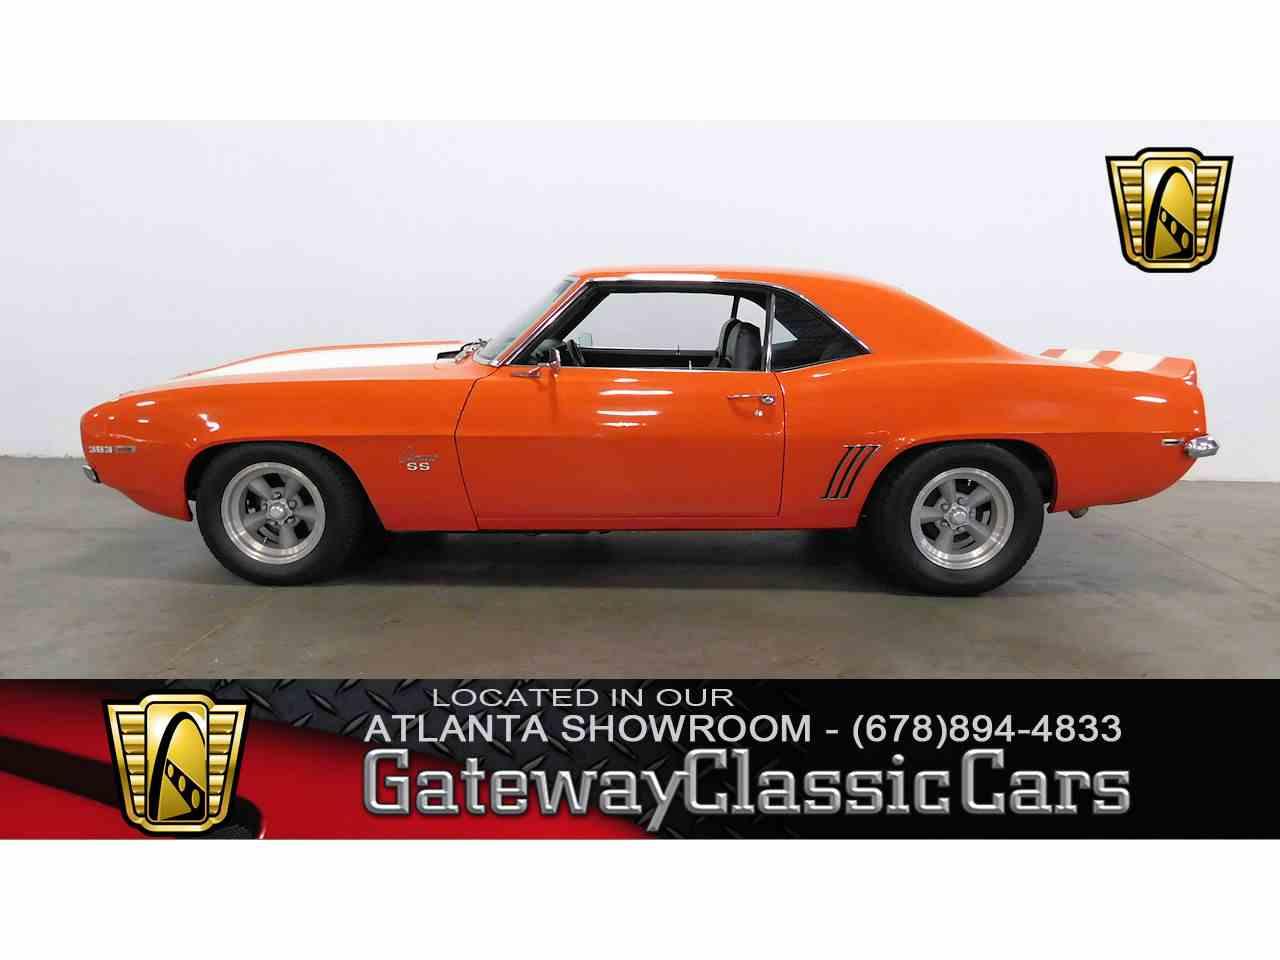 1969 camaro for sale in georgia - 1969 Chevrolet Camaro For Sale Cc 1023954